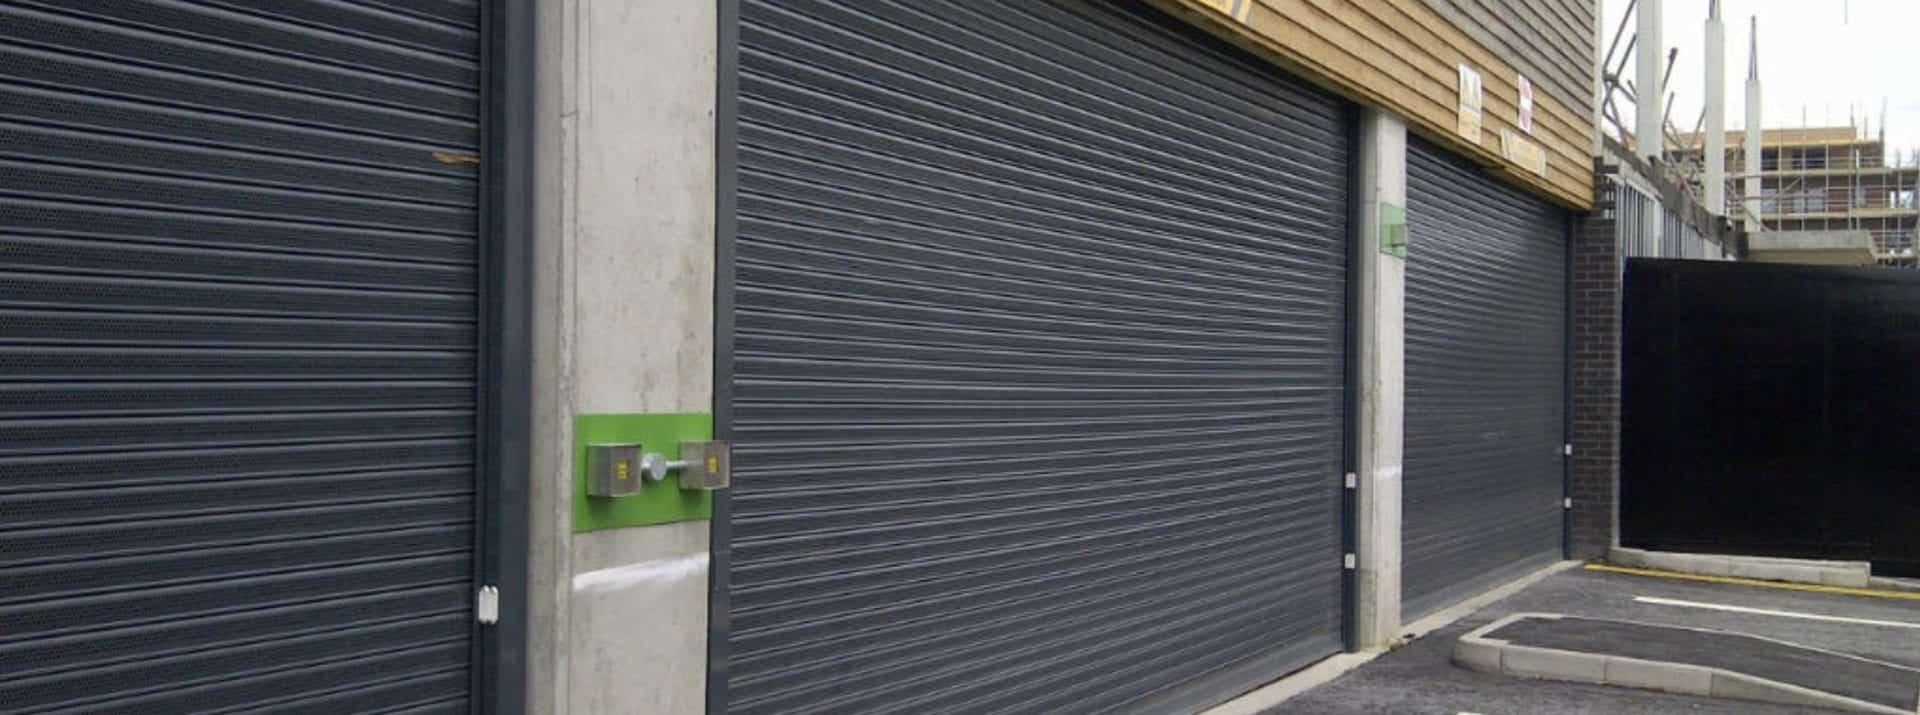 car park security shutters